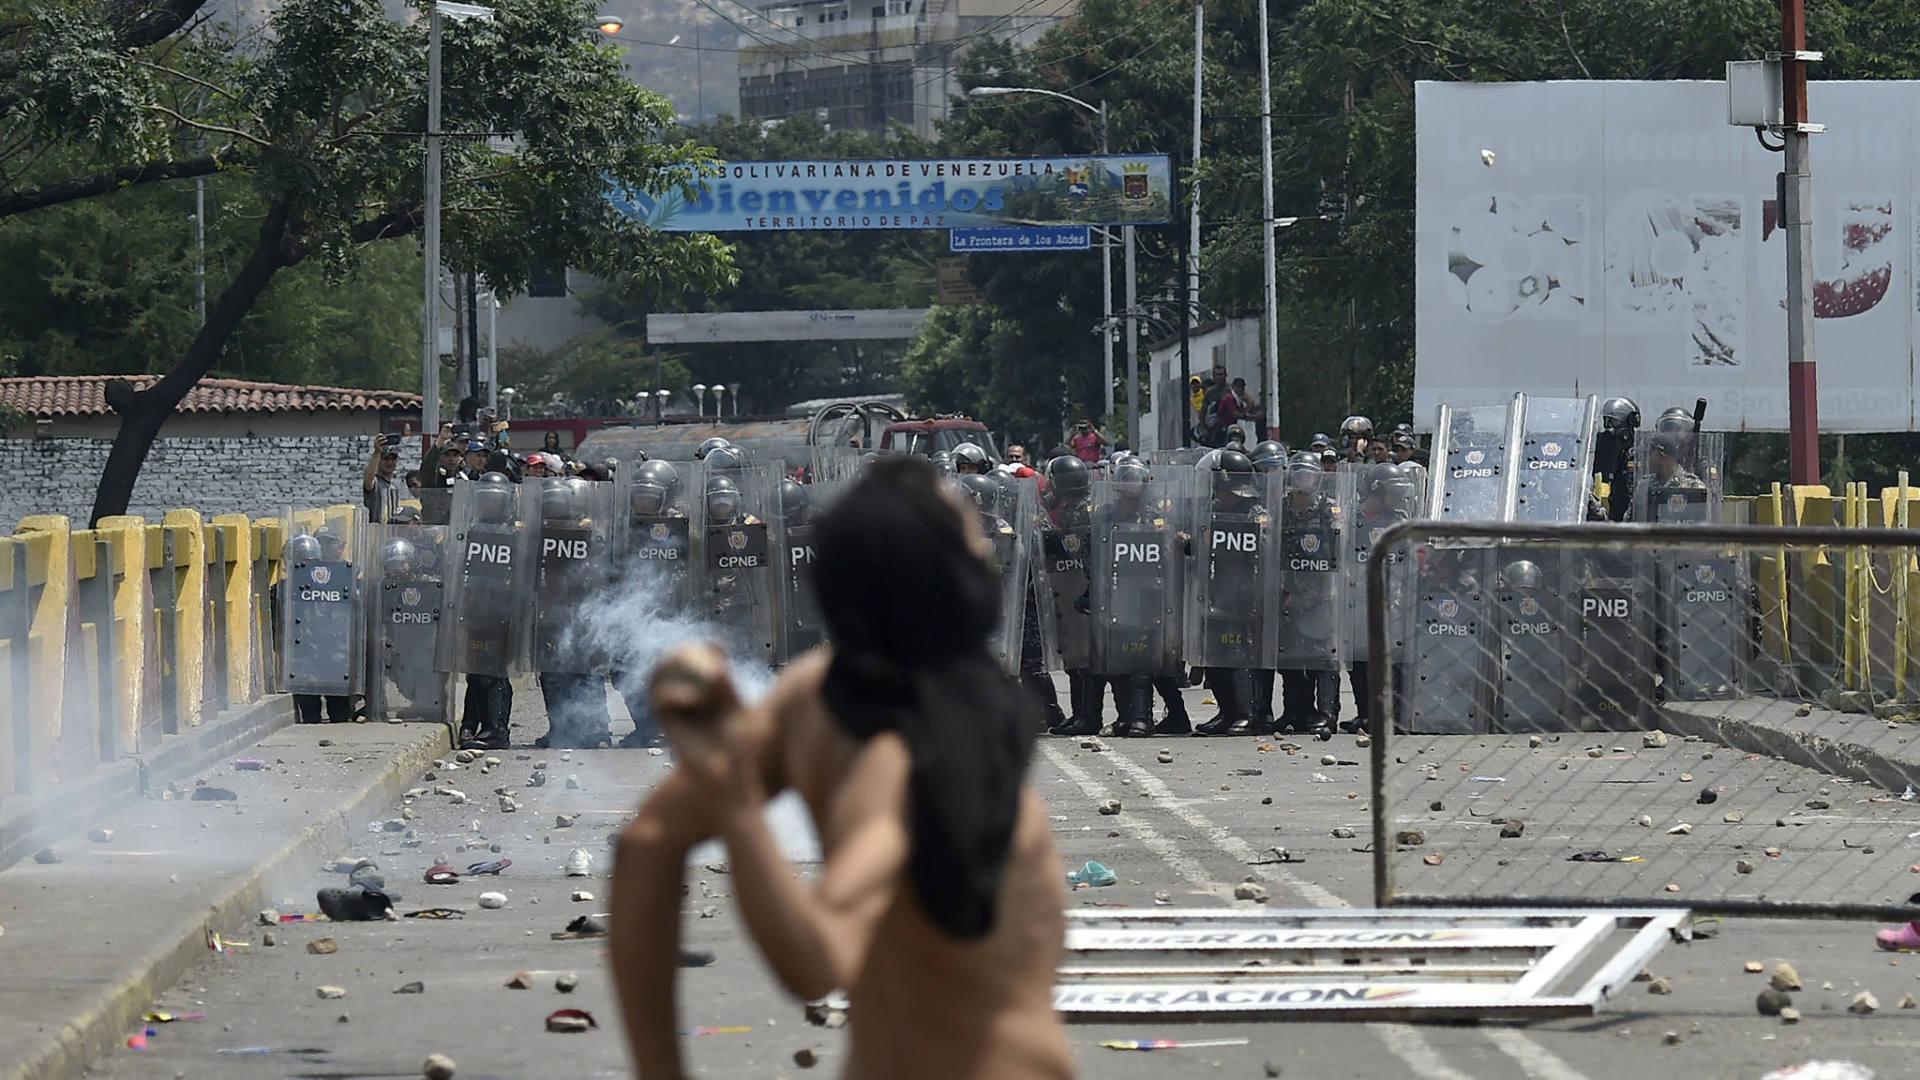 Deadly clashes in Venezuela as Maduro blocks aid